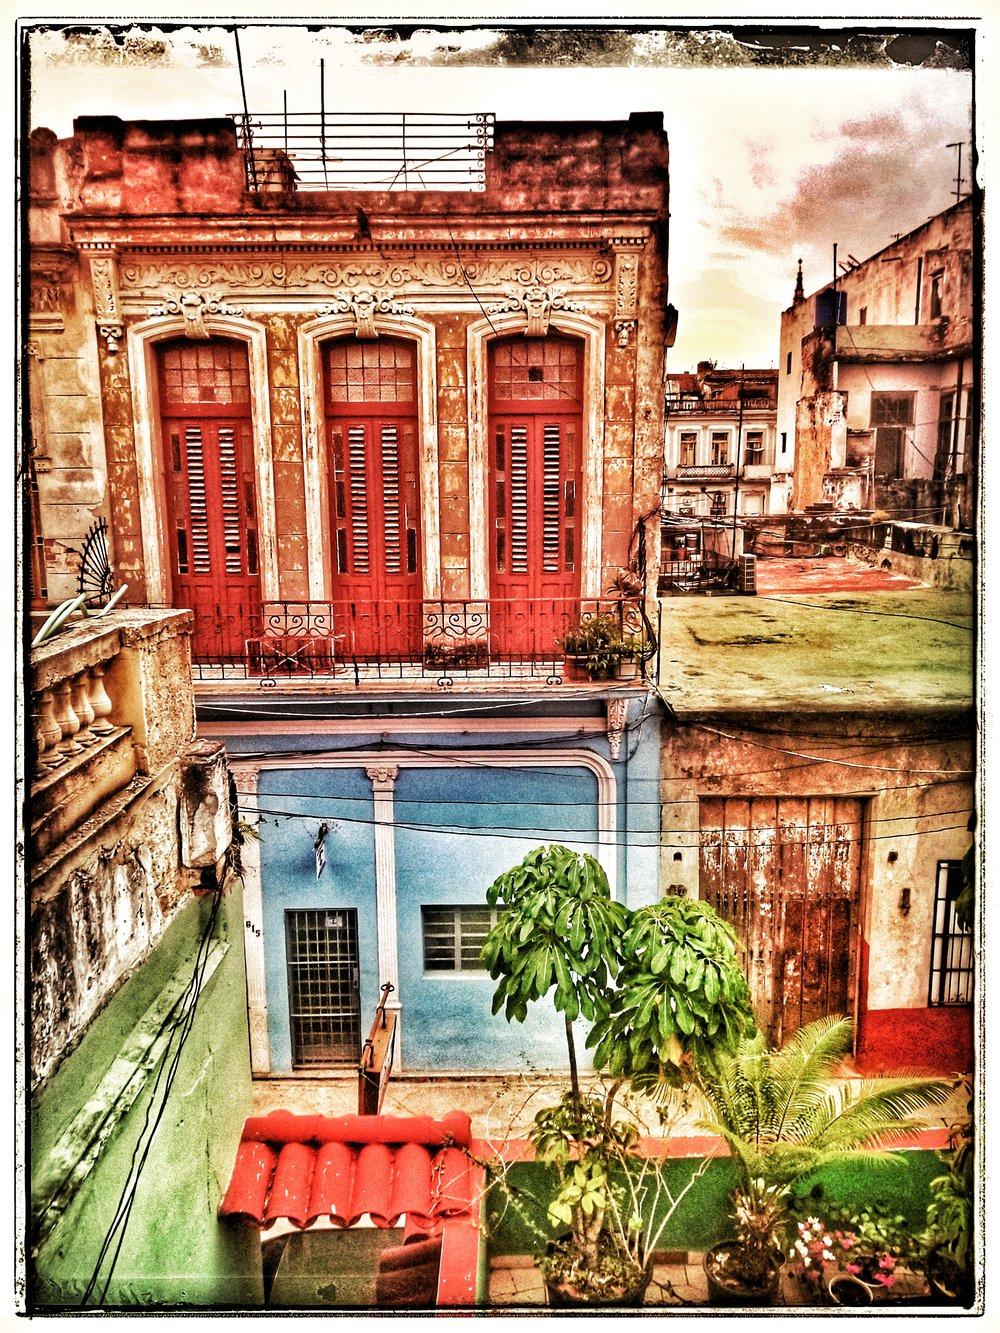 Casa Dayami de Cervantes Calle San Martin Edy La Vieja Old Havana (2).jpeg